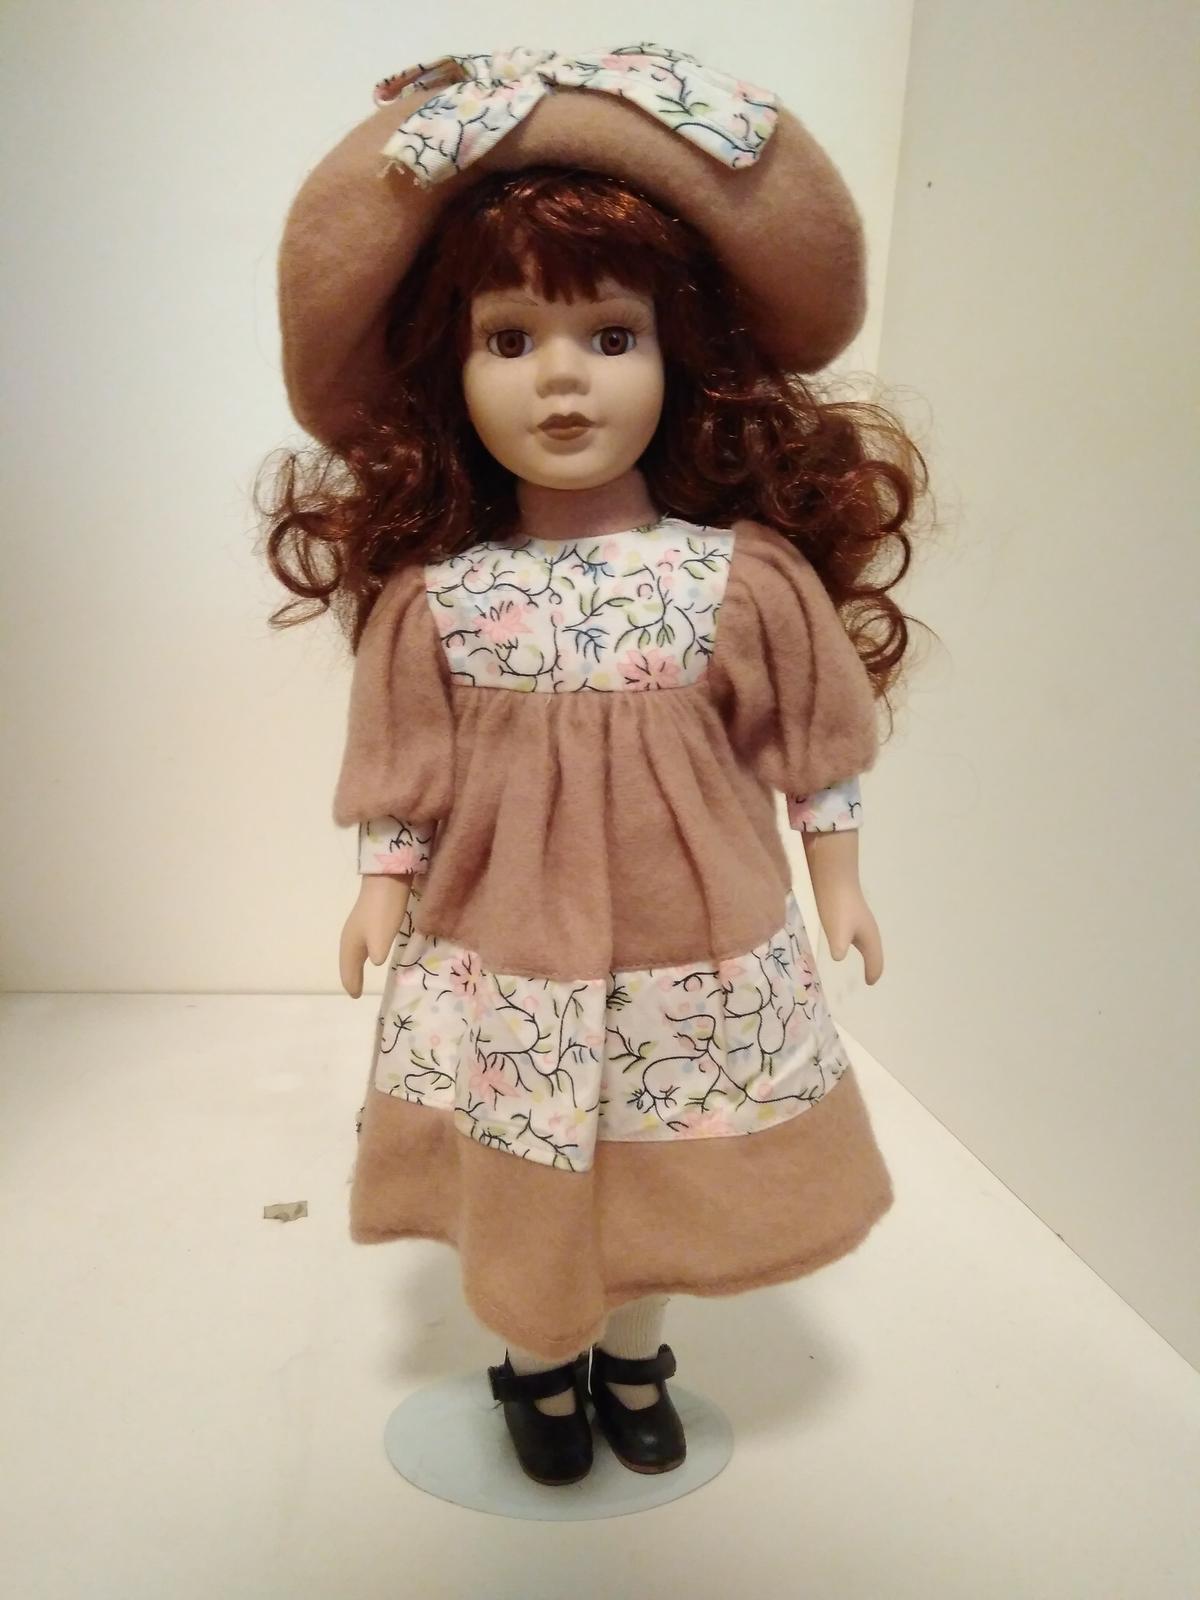 Ahojte, ponukam porcelanovu babiku... - Obrázok č. 1